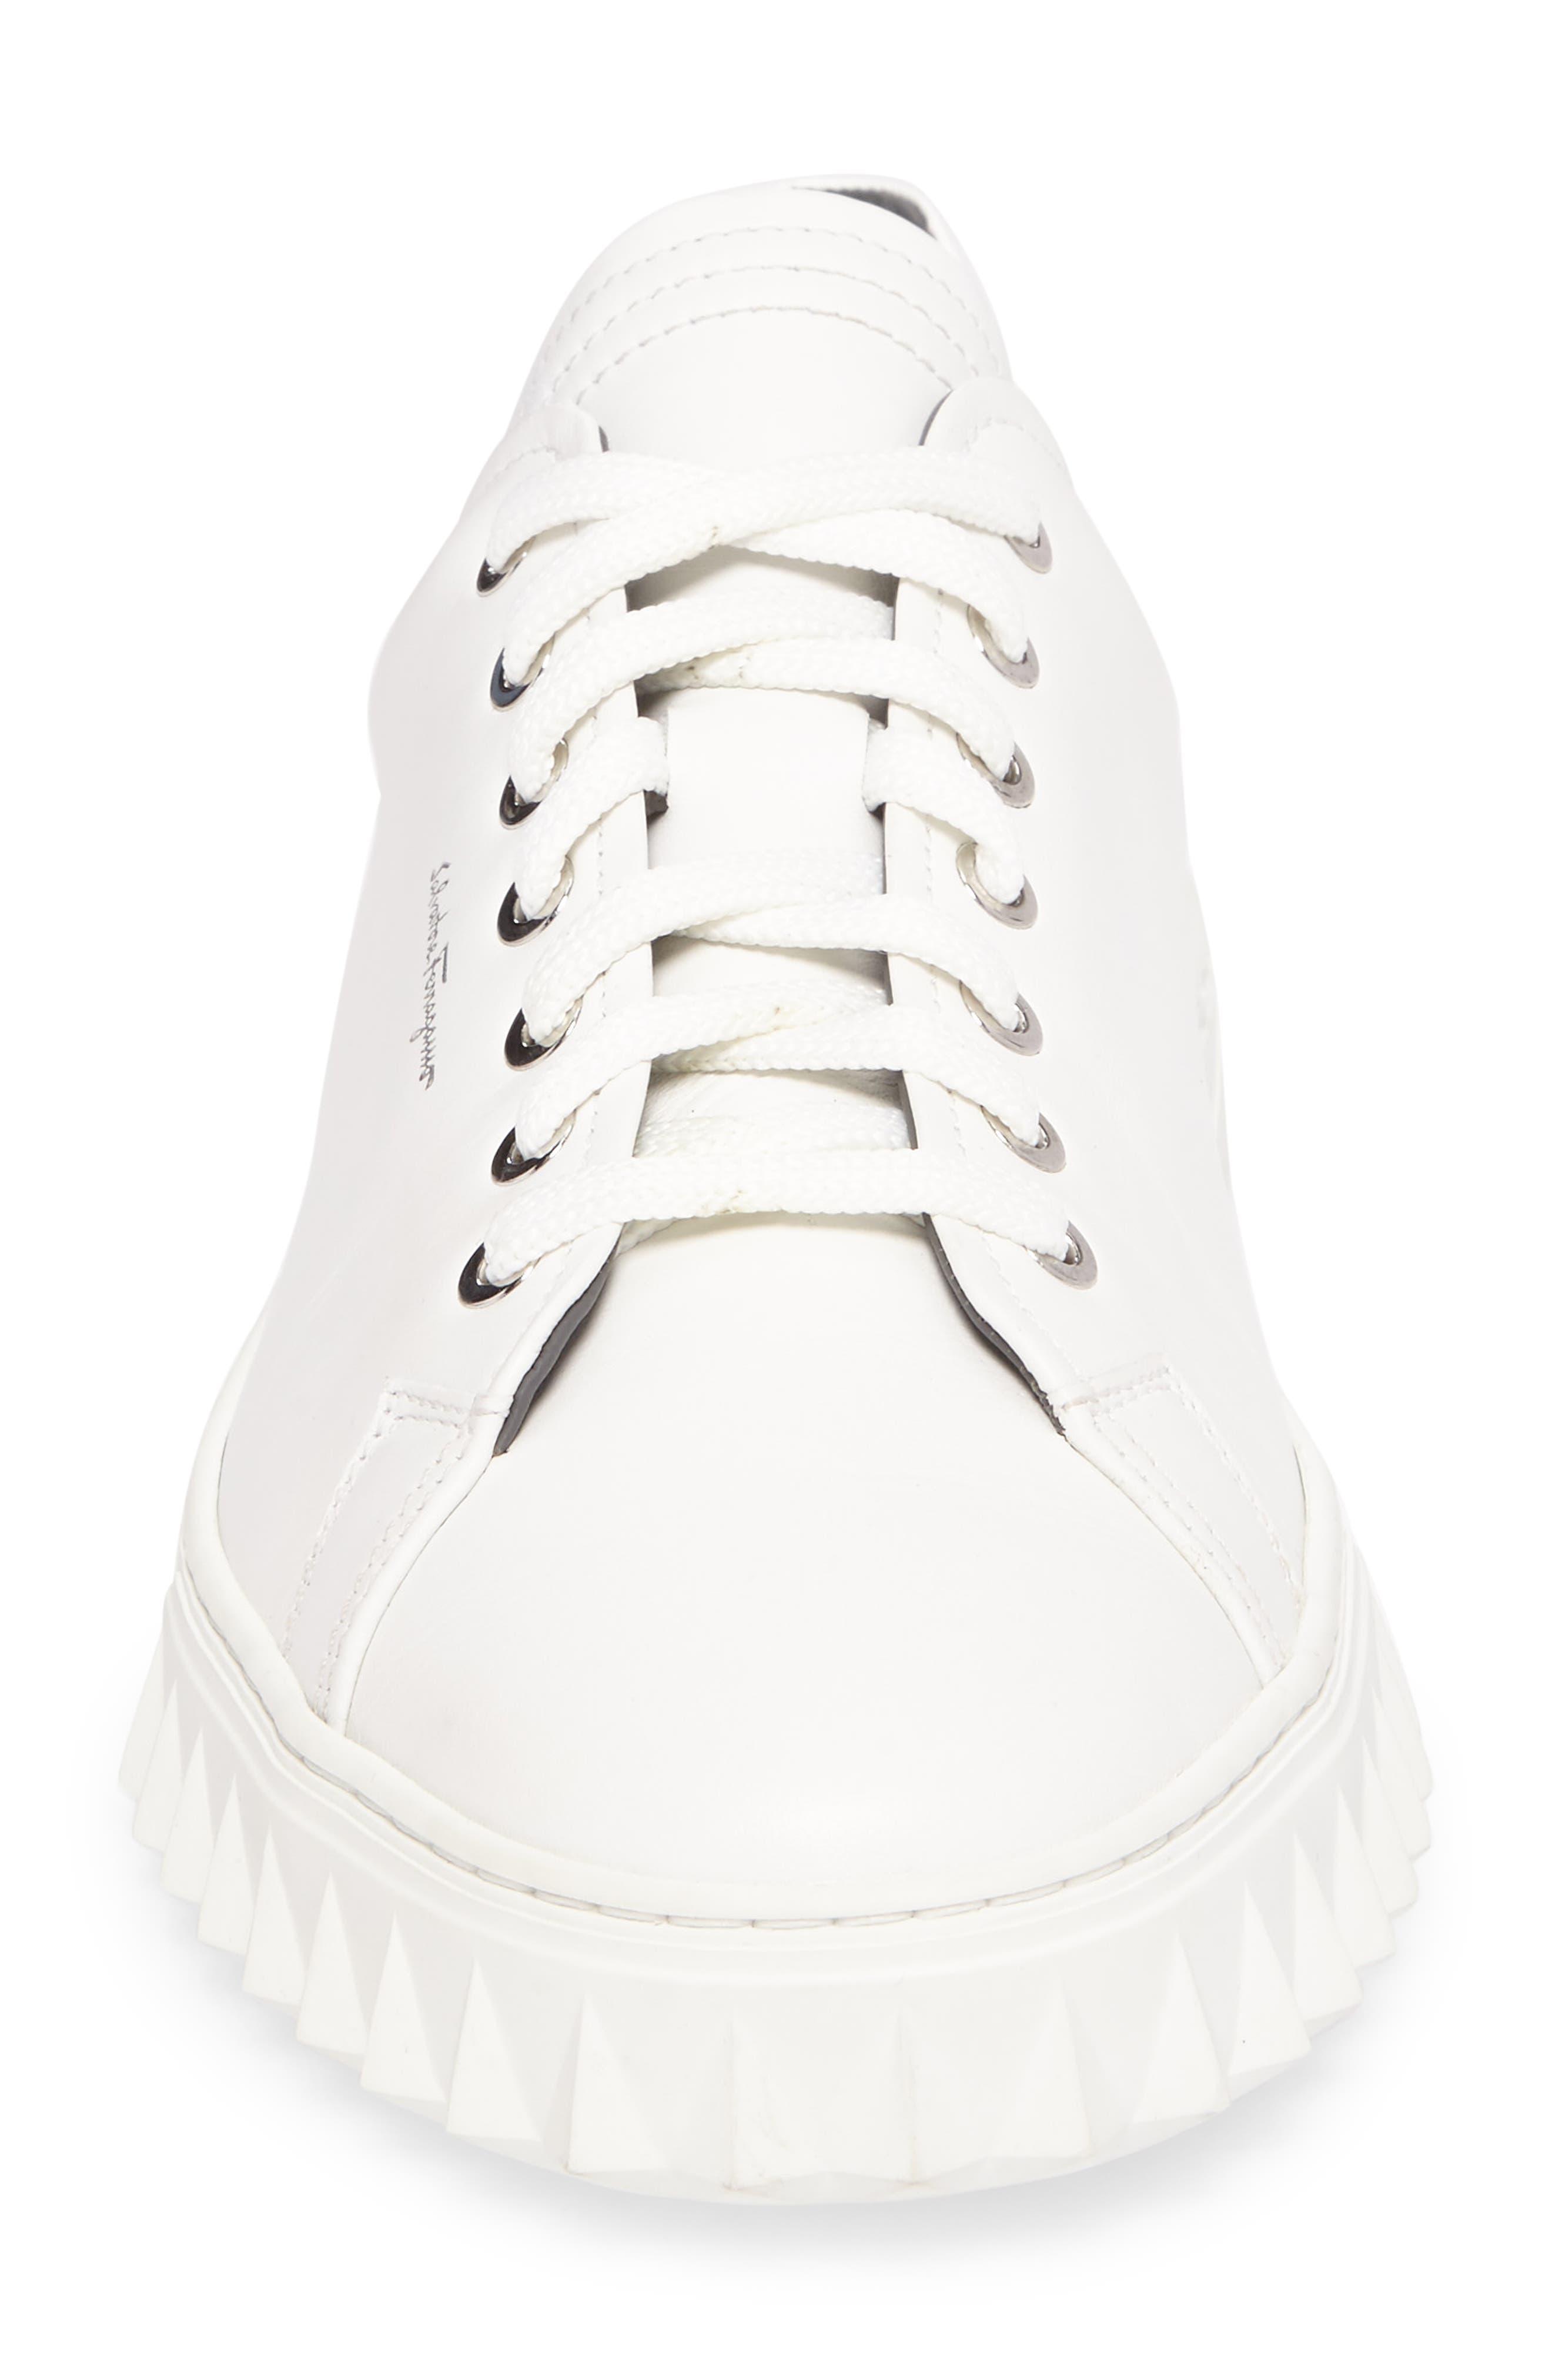 Cube Sneaker,                             Alternate thumbnail 4, color,                             BIANCO